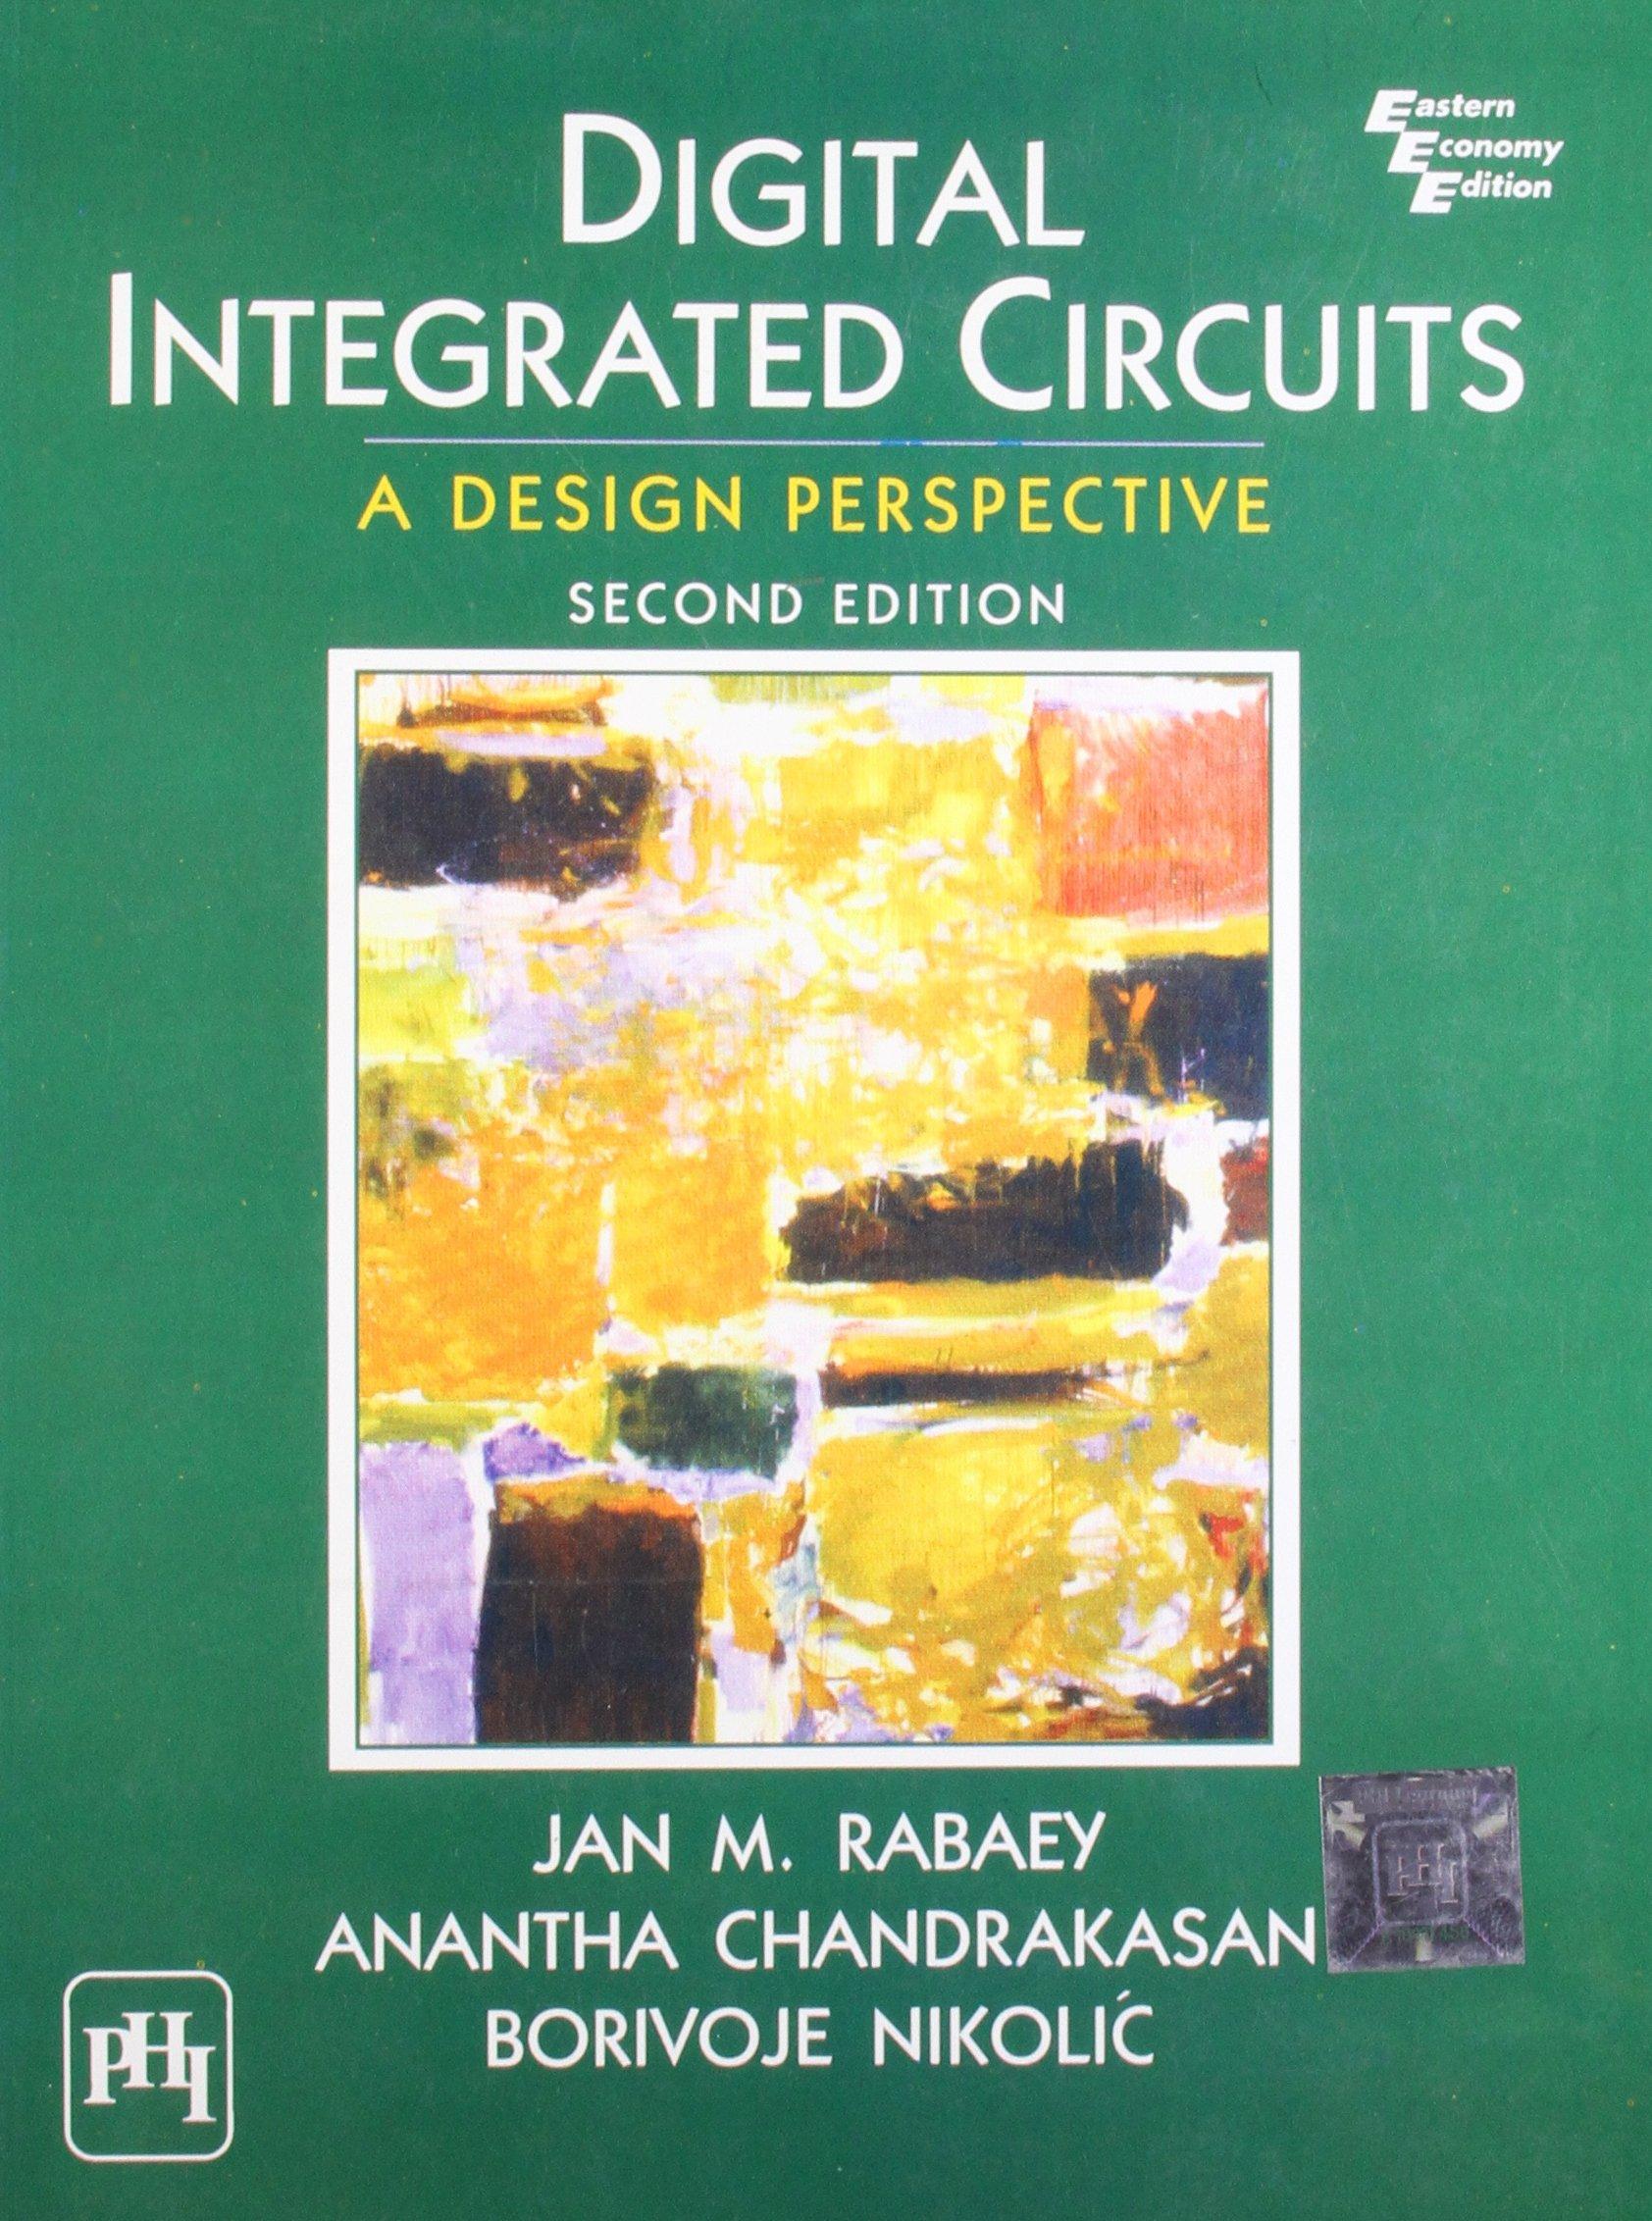 Jan M Rabaey Digital Integrated Circuits A Design Perspectiveprent